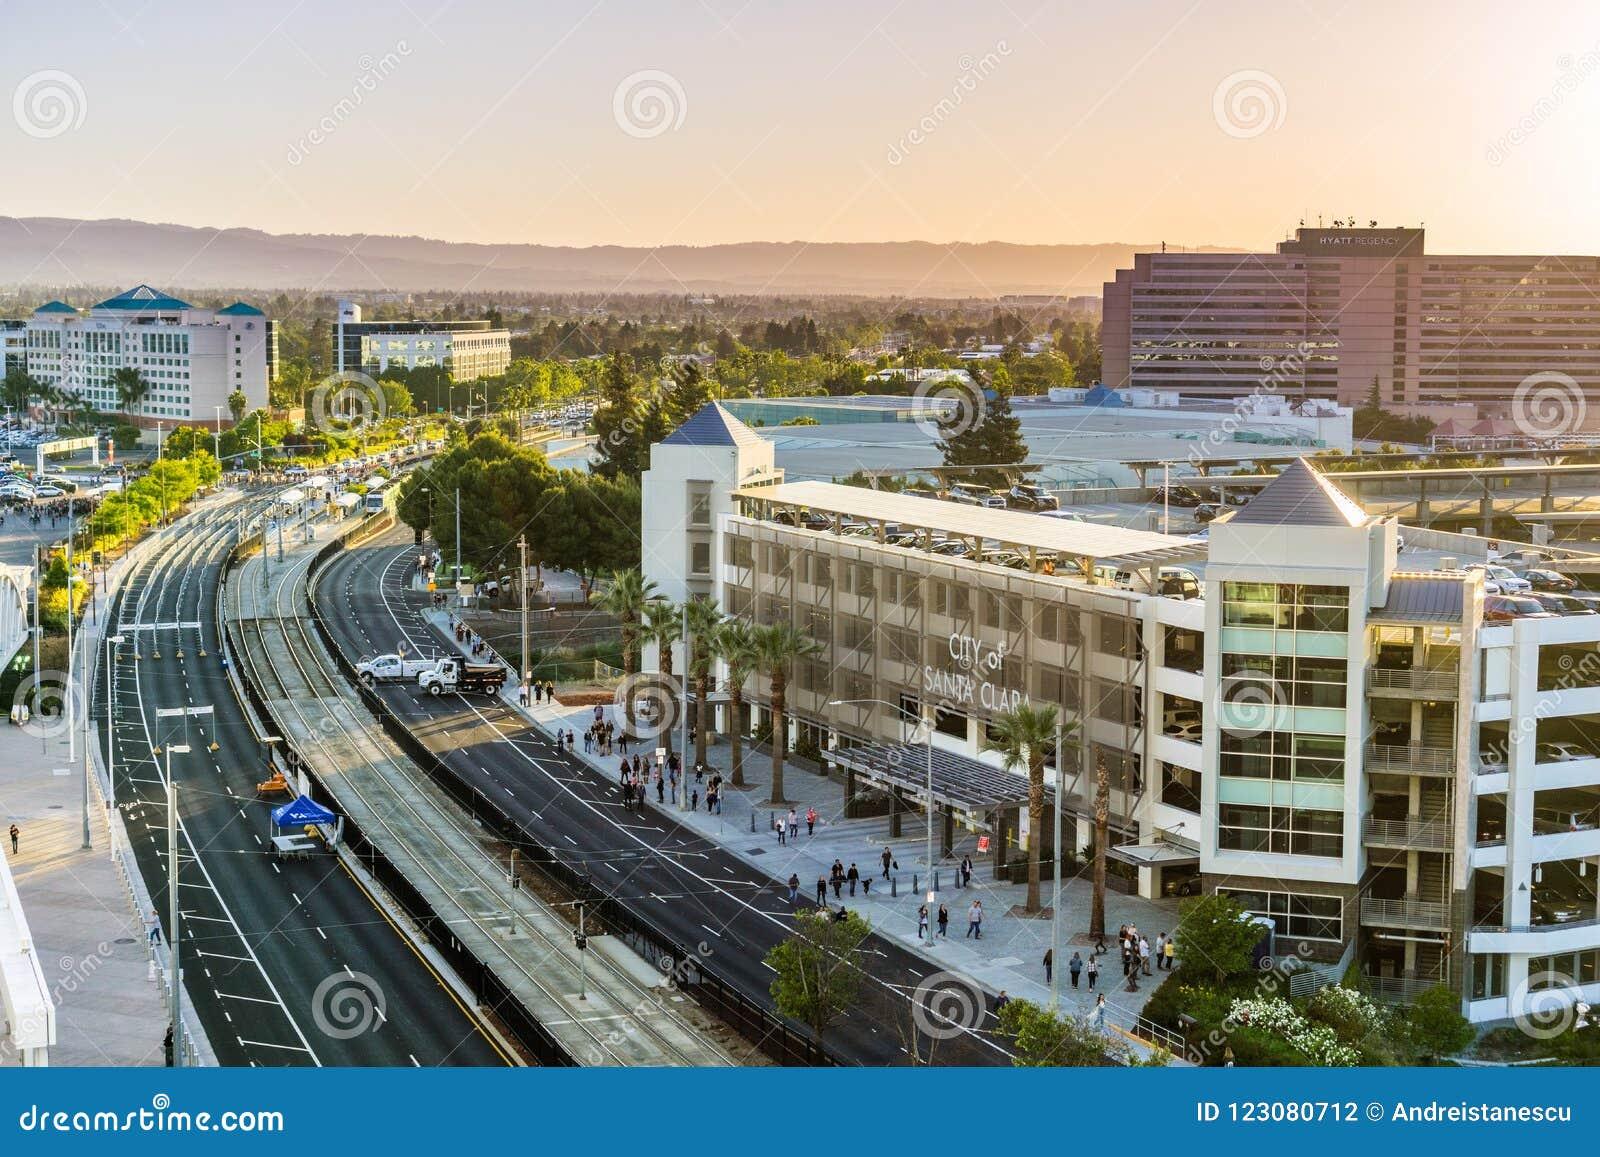 Paisagem urbana em Santa Clara, Califórnia